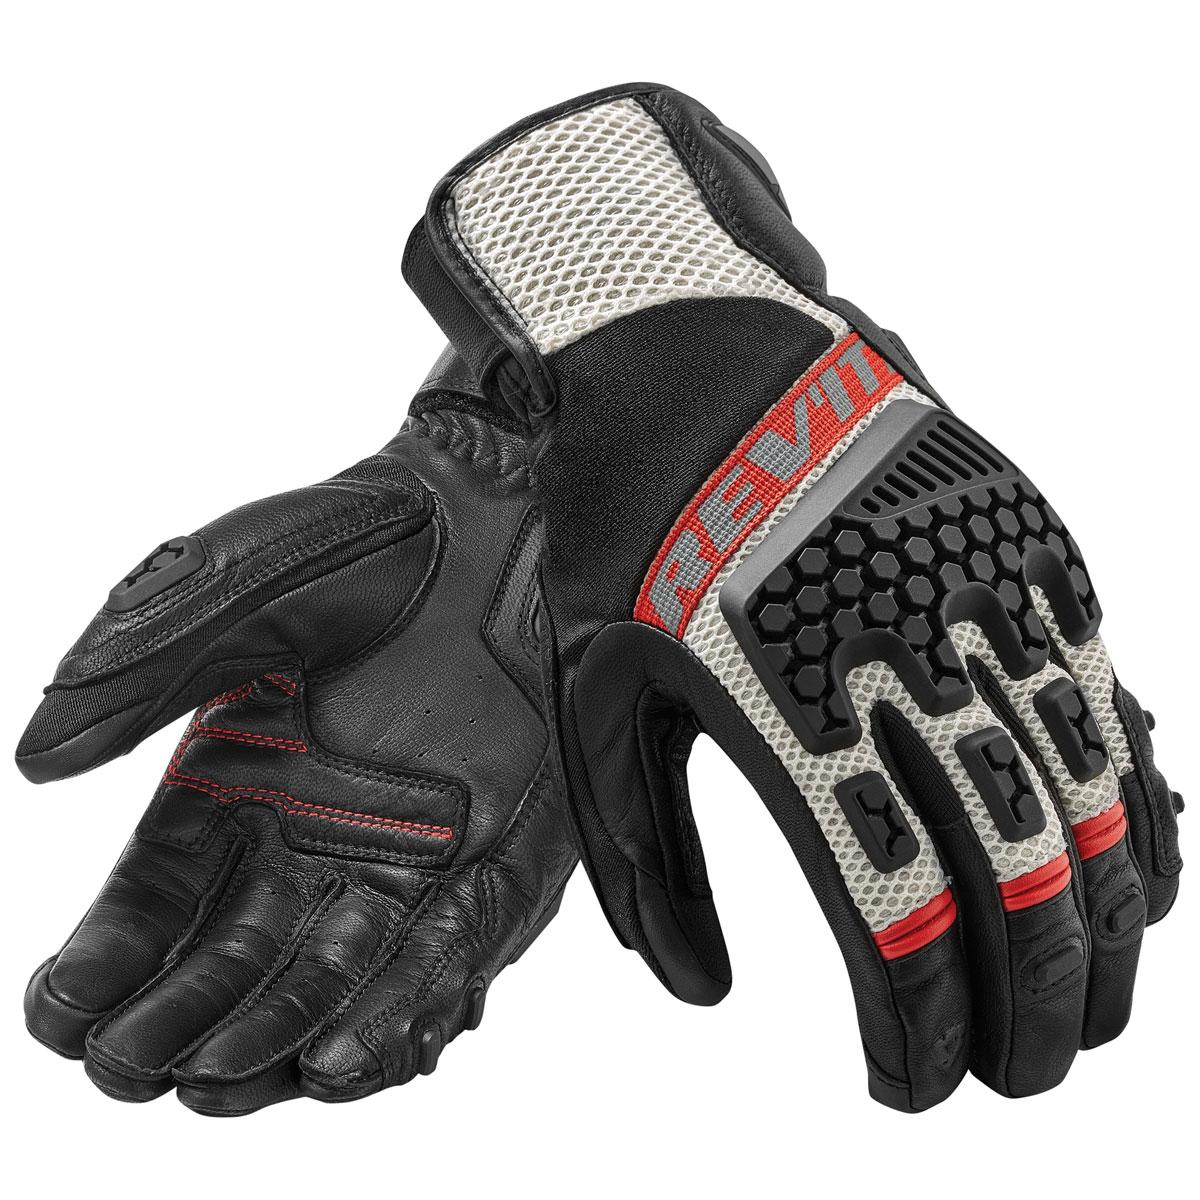 REV′IT! Men's Sand 3 Black/Red Gloves